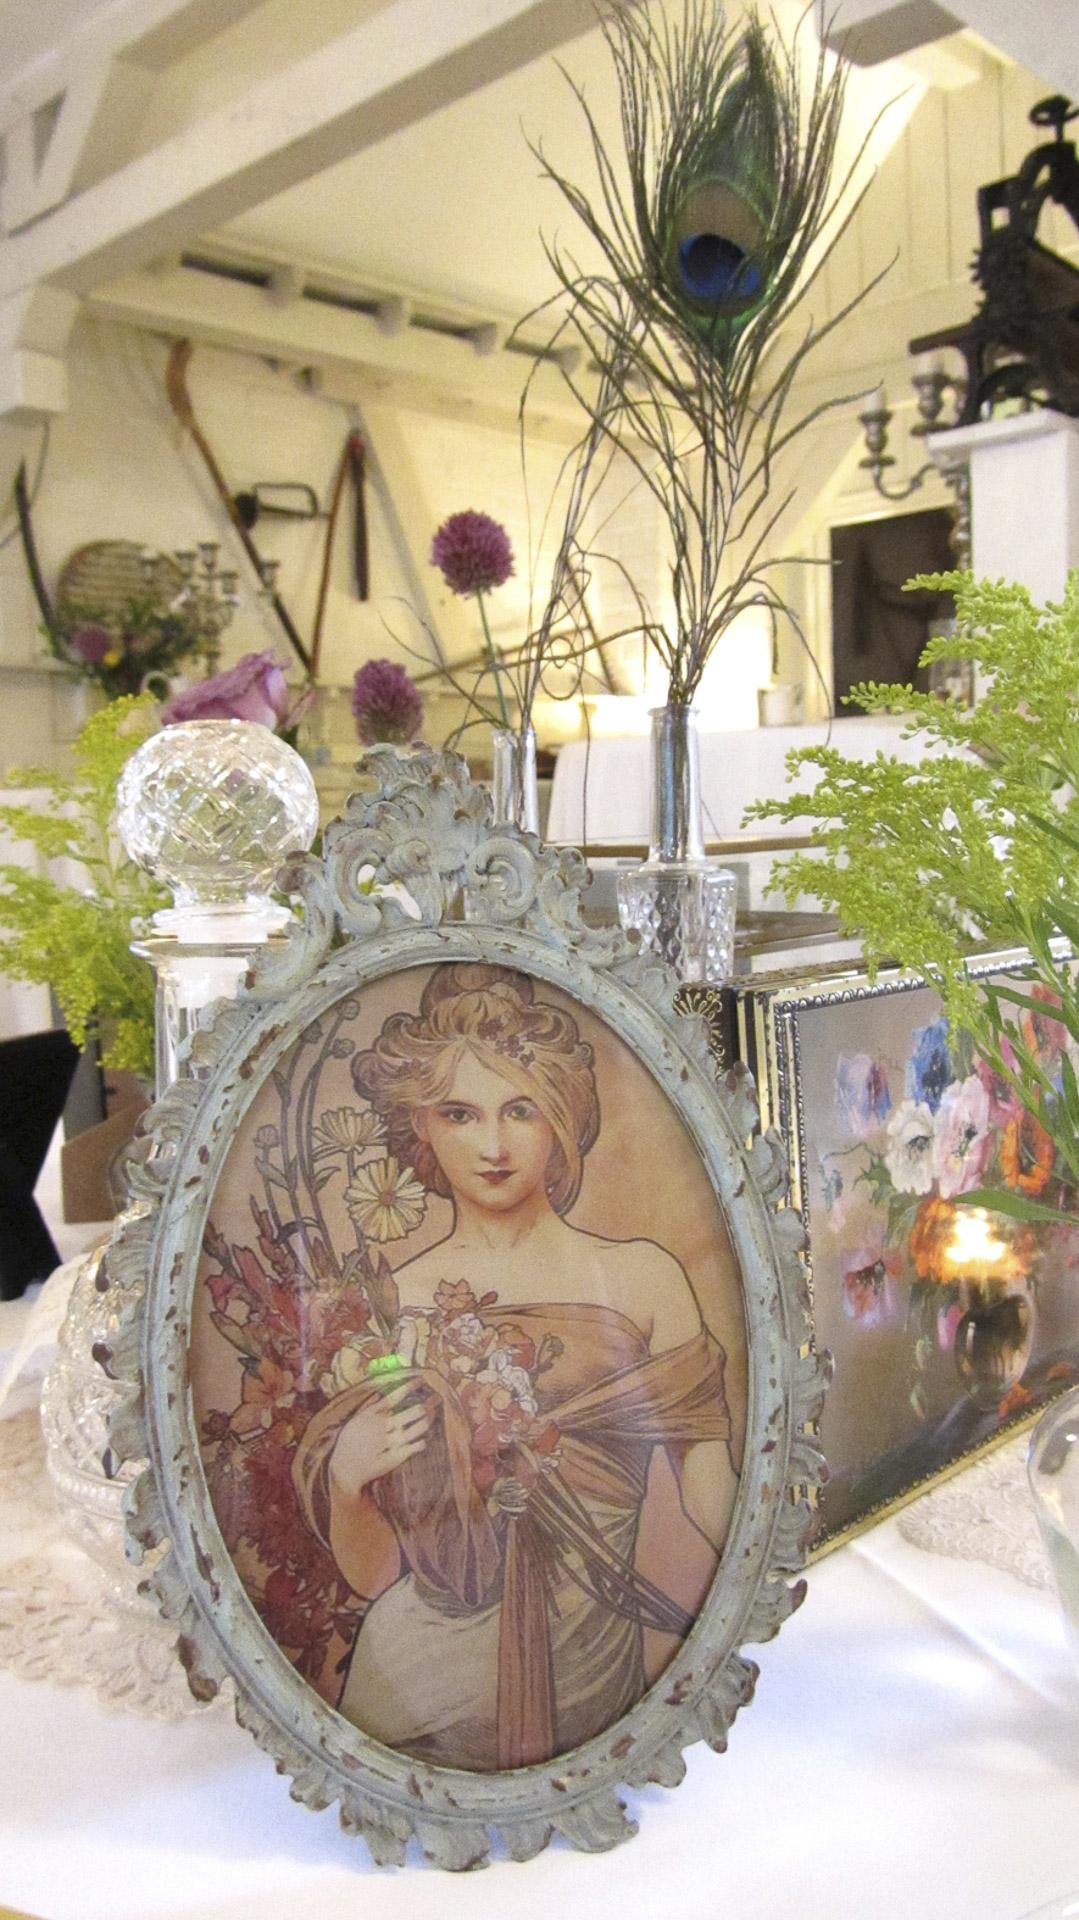 nassimshams autumnfairytale 4 the wedding table. Black Bedroom Furniture Sets. Home Design Ideas